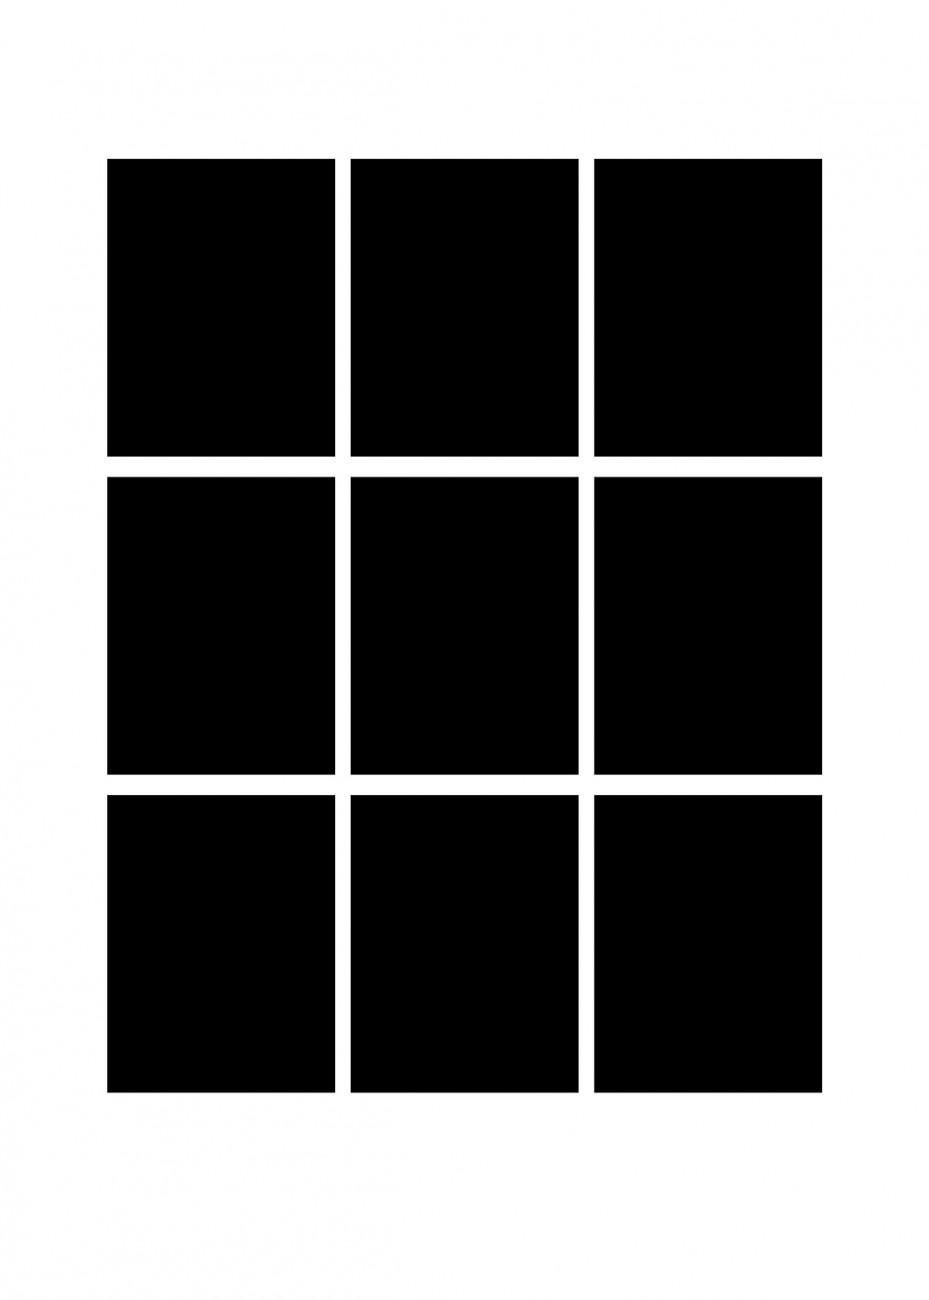 50x70 cm 03 - 9 bilder